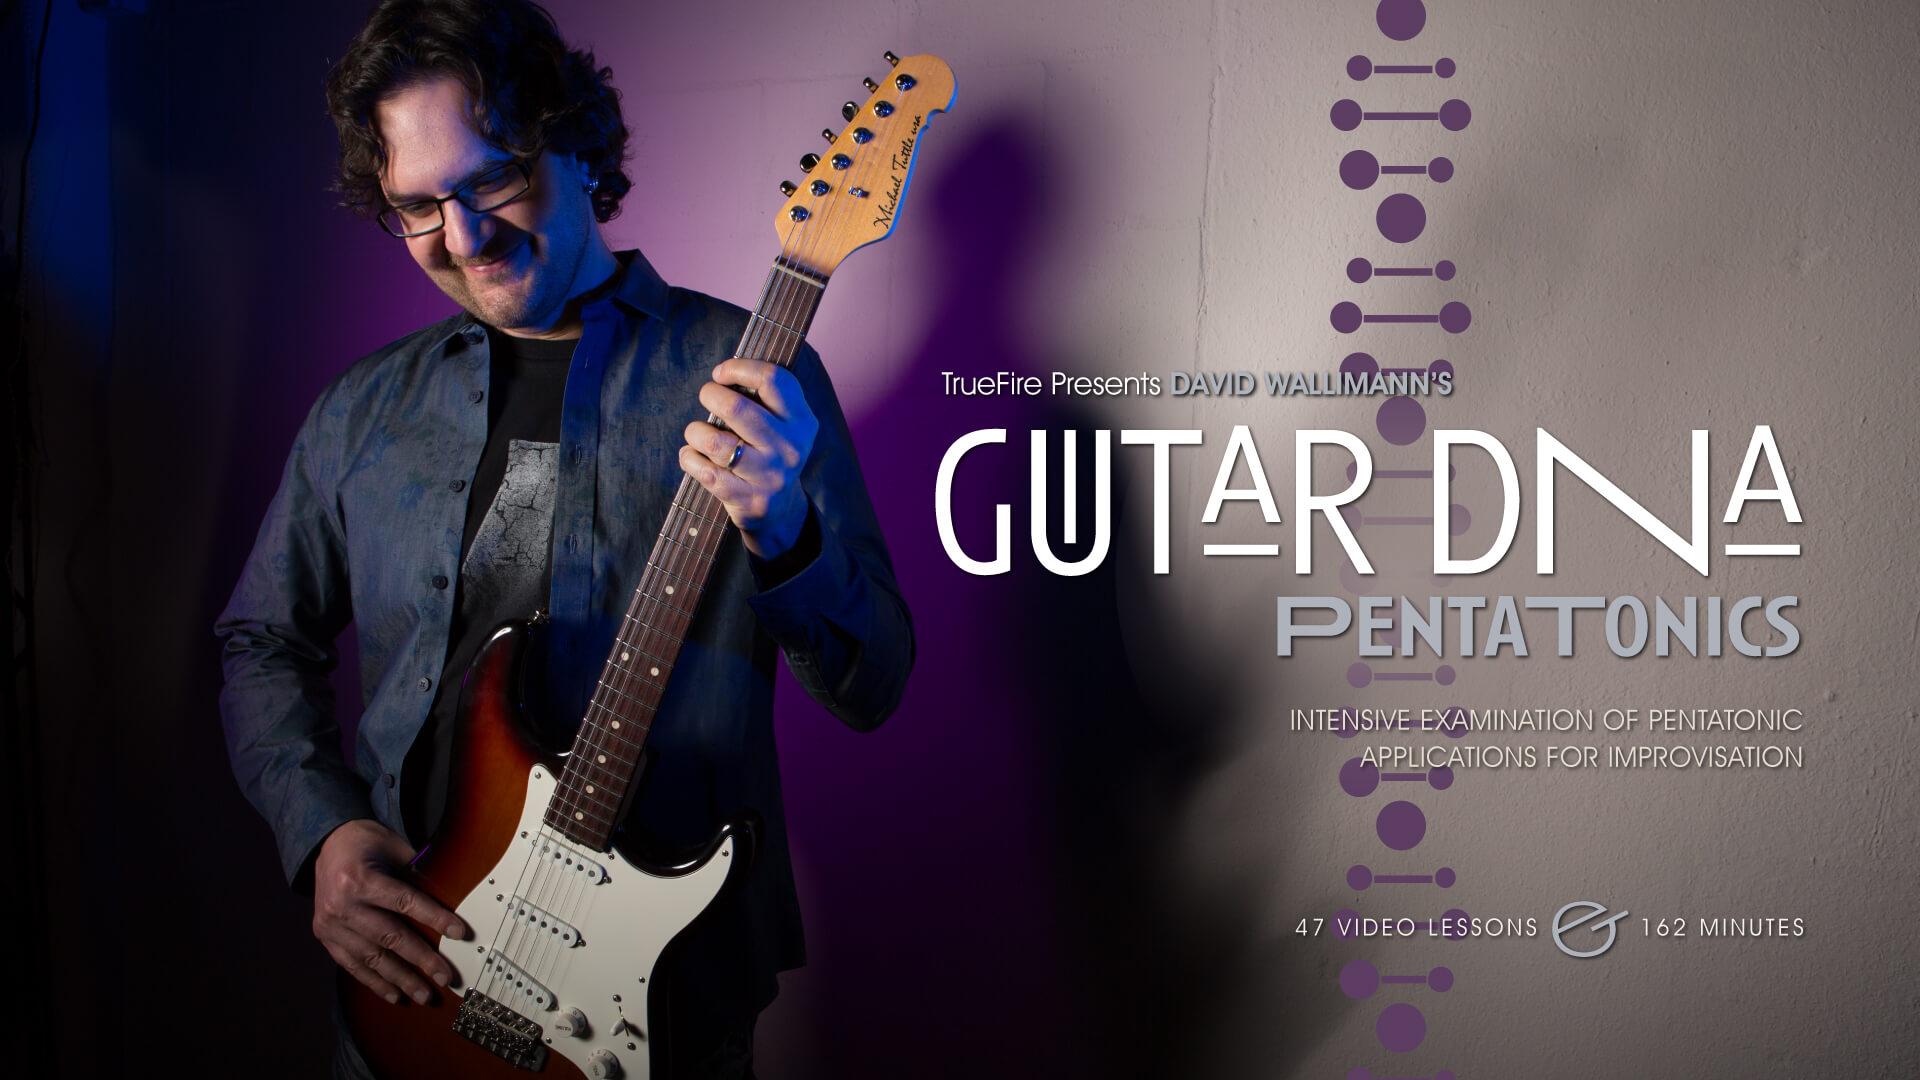 Guitar Dna Pentatonics Guitar Lessons David Wallimann Truefire